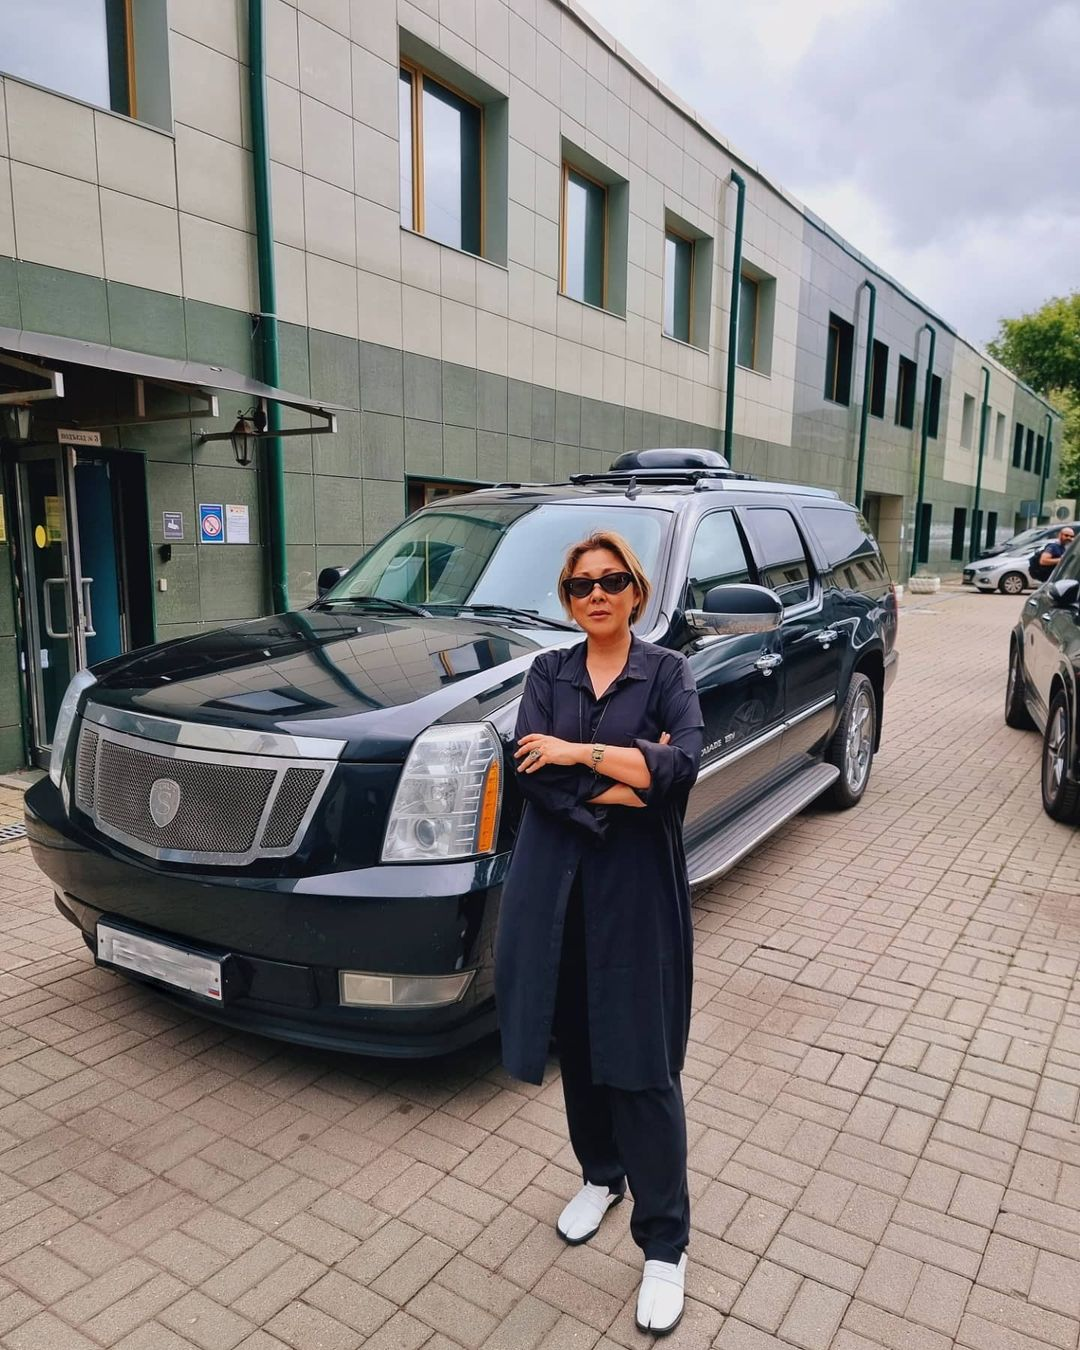 Anita Tsoi sold her luxurious Cadillac